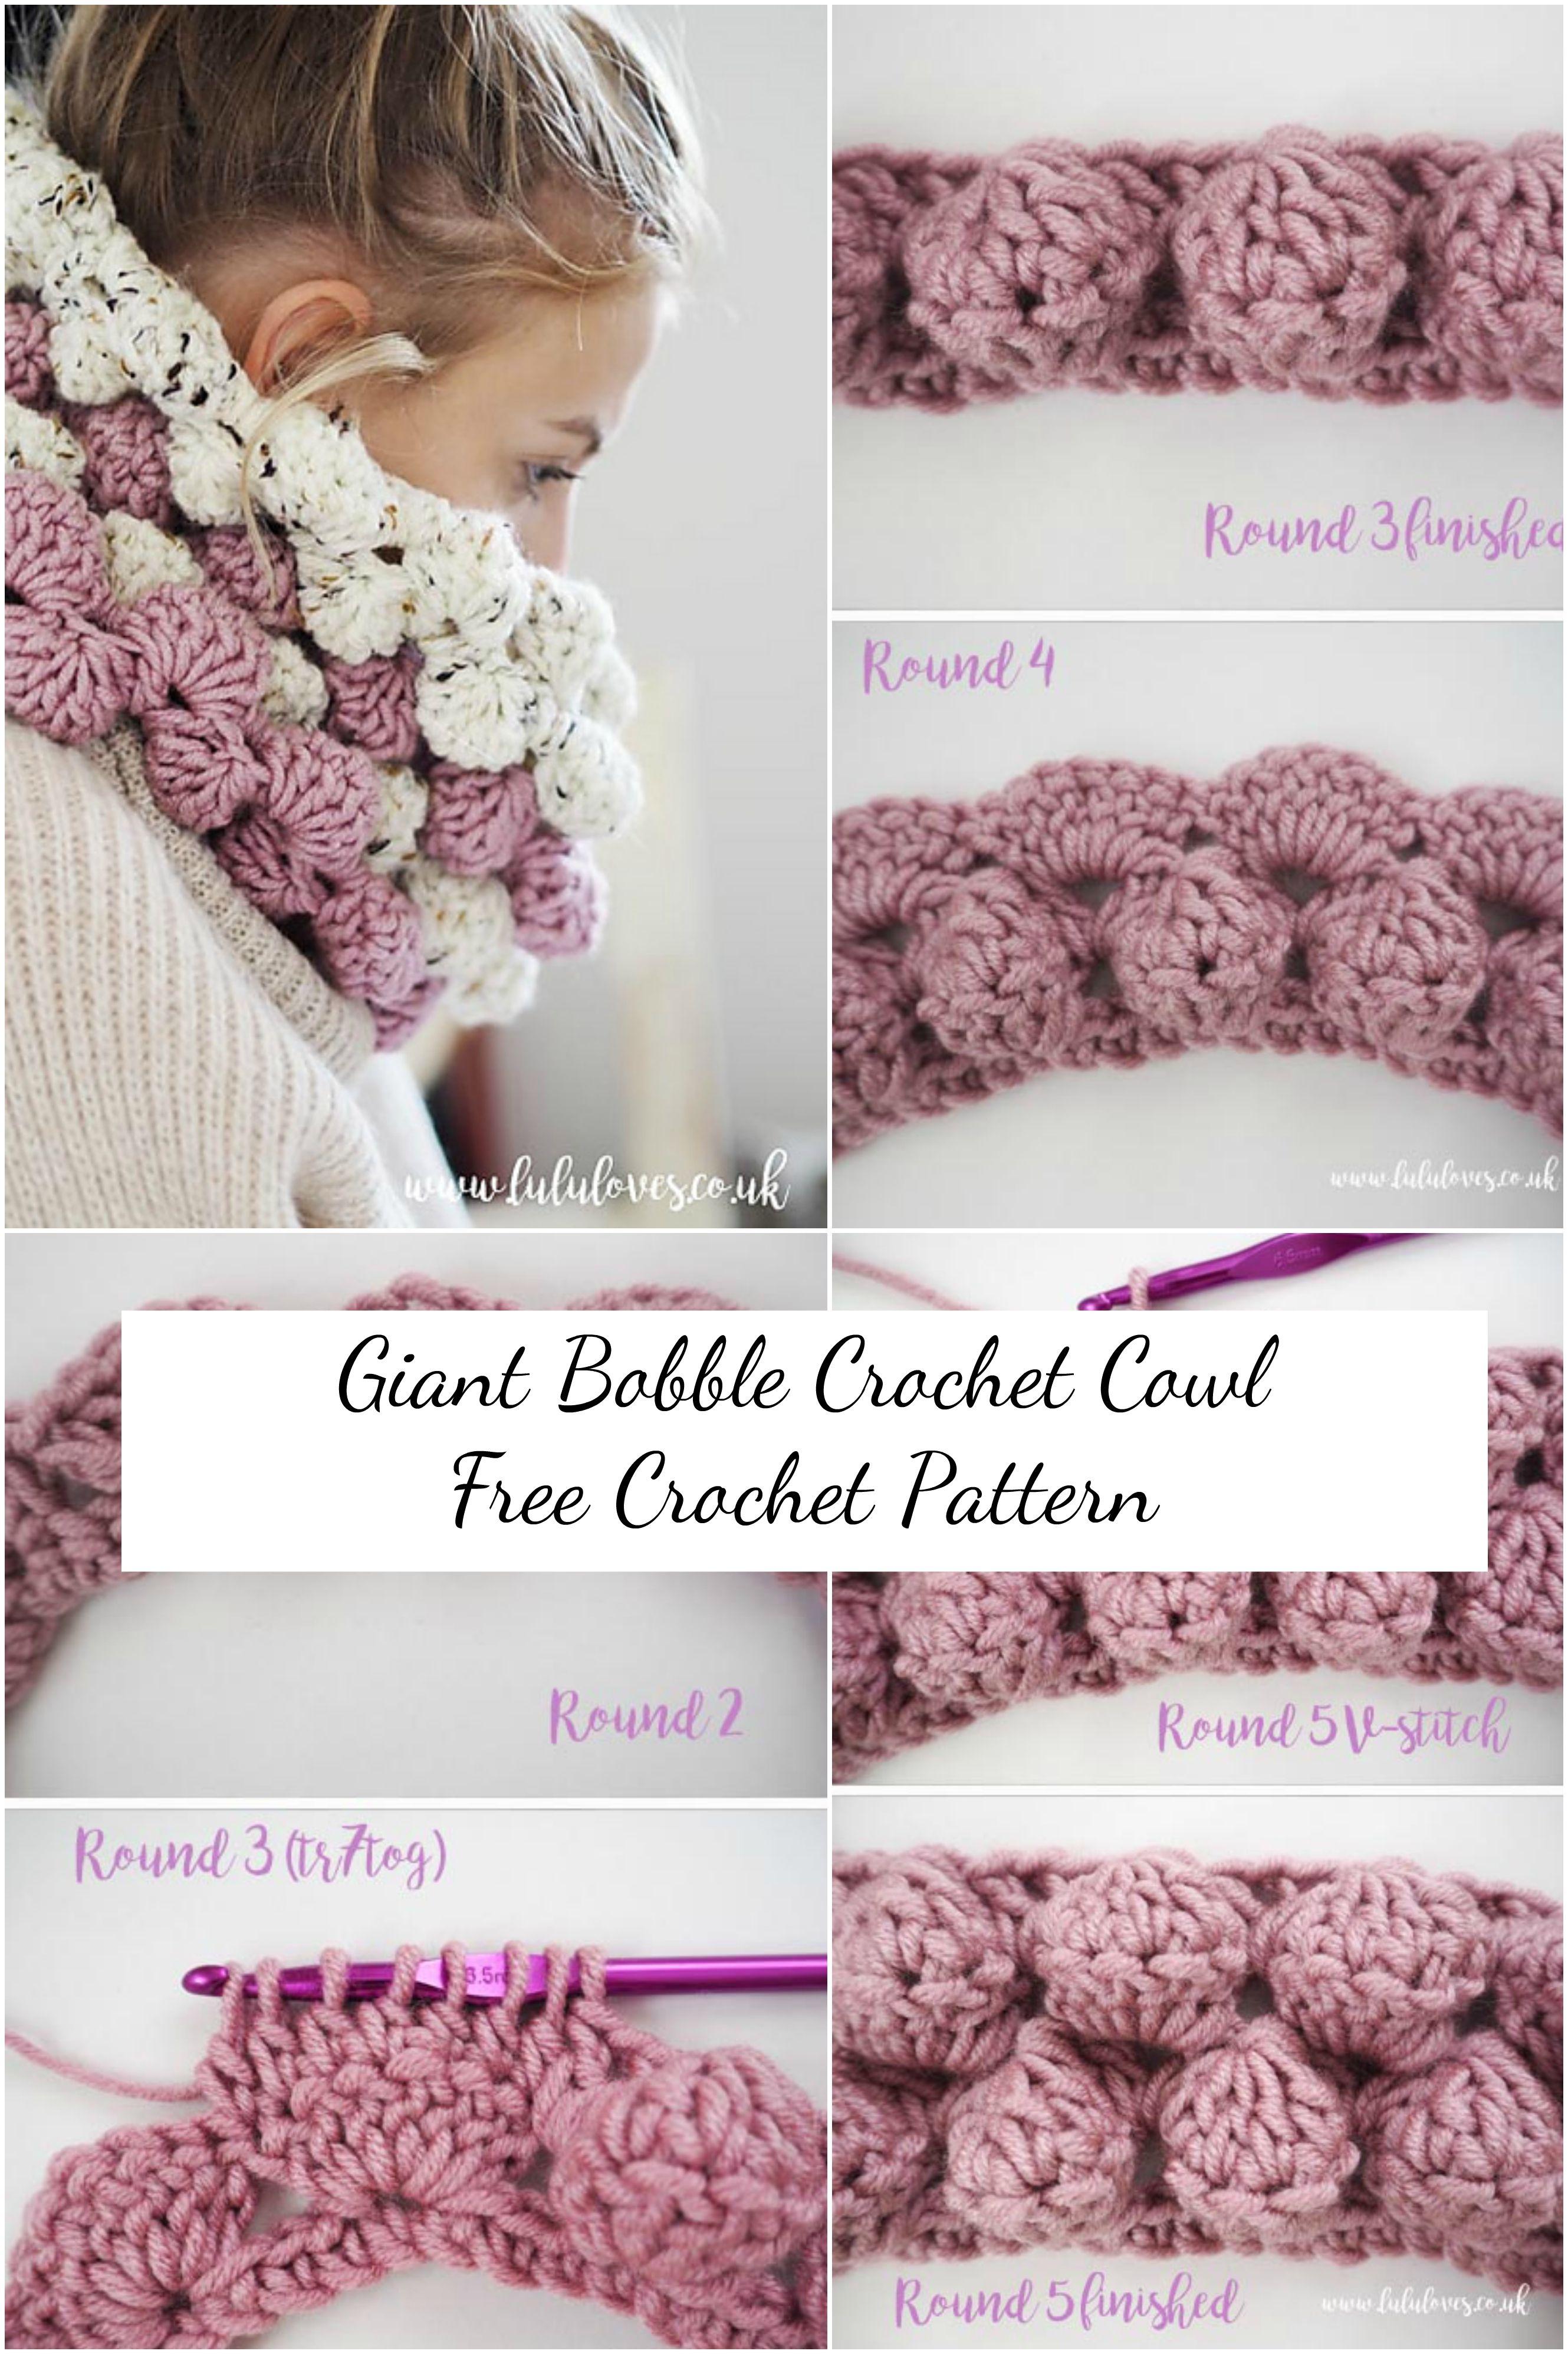 Giant Bobble Cowl Crochet Pattern | Anleitung stricken, Amigurumi ...